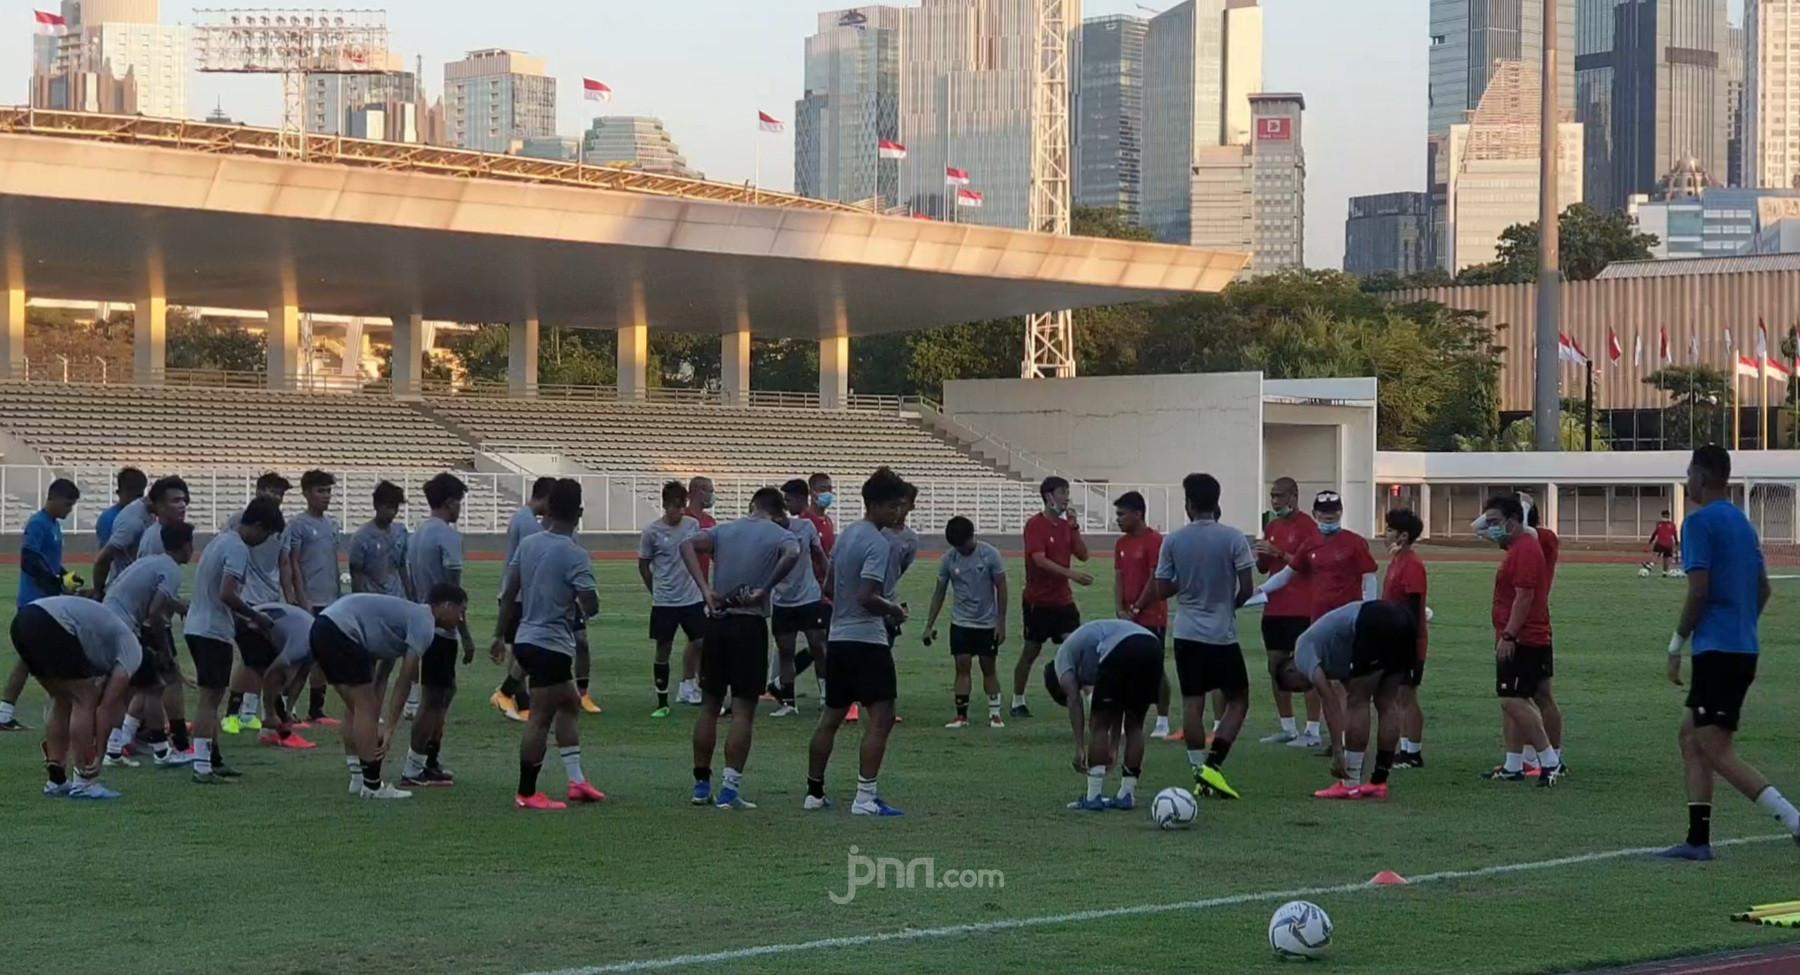 Latihan Perdana Timnas Indonesia U-19 Digelar Tertutup, Shin Tae Yong ke Mana? - JPNN.com